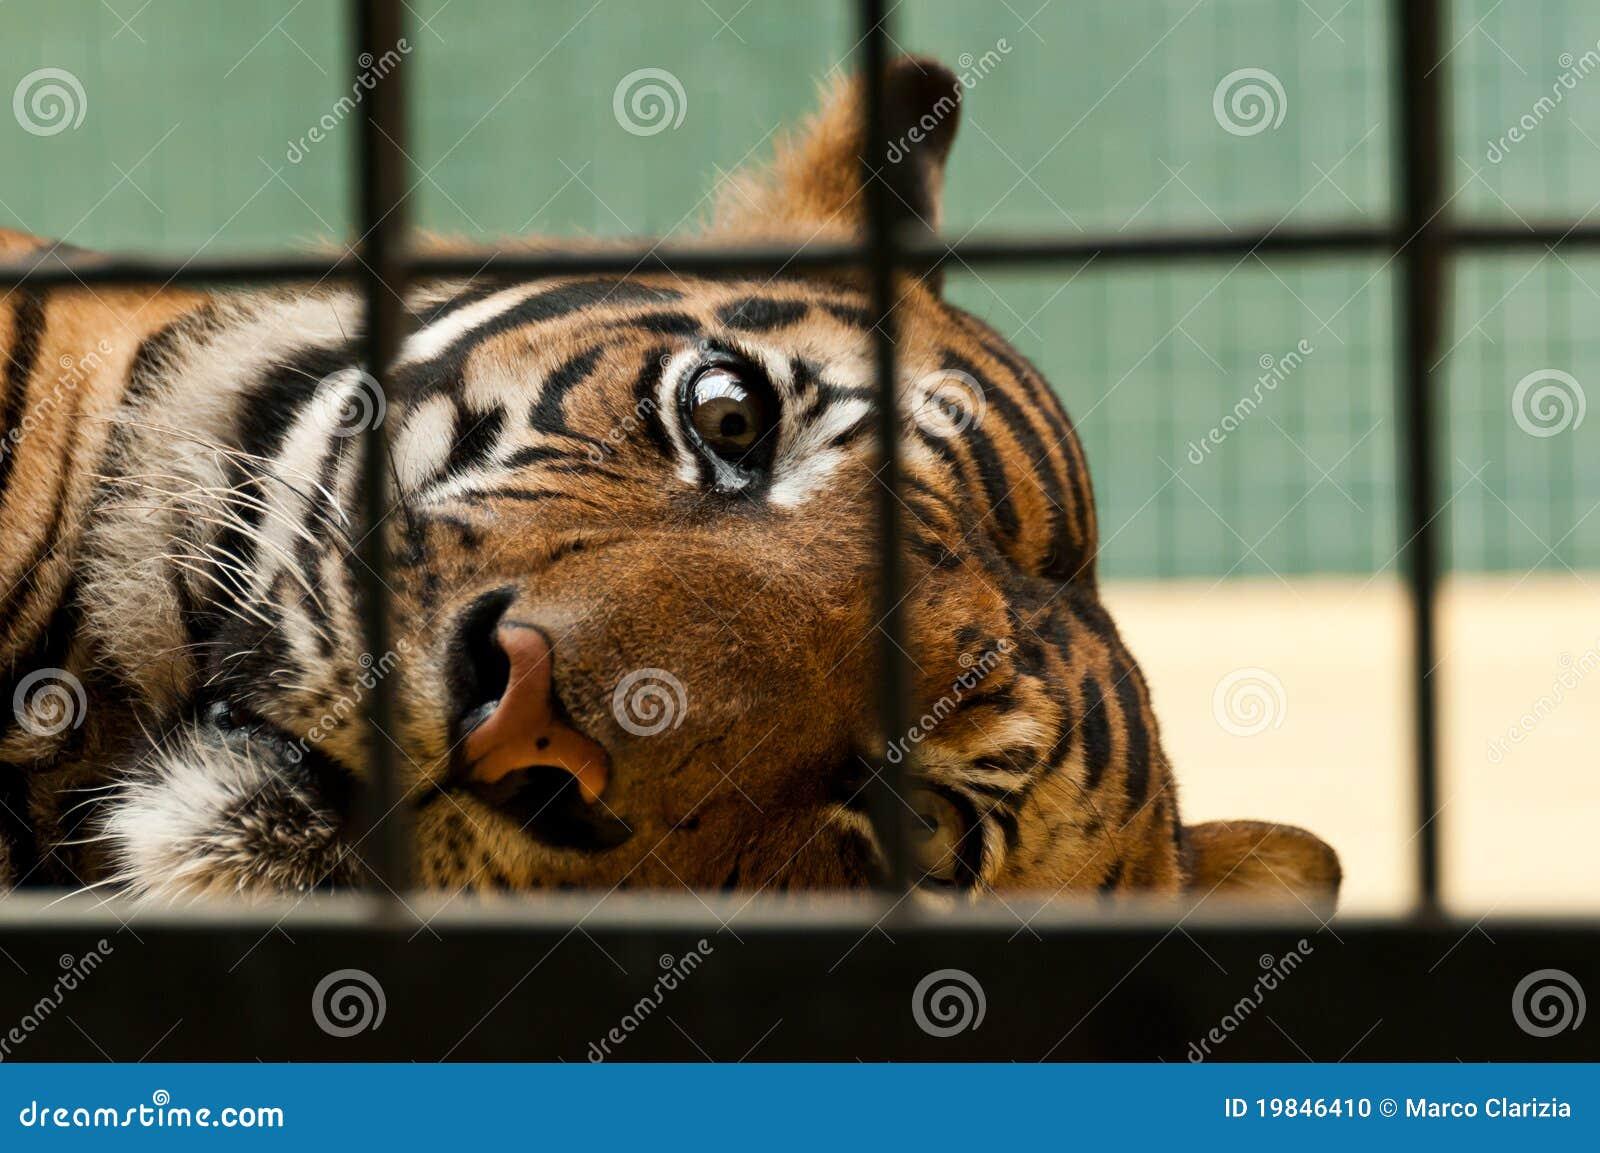 Powerless tiger